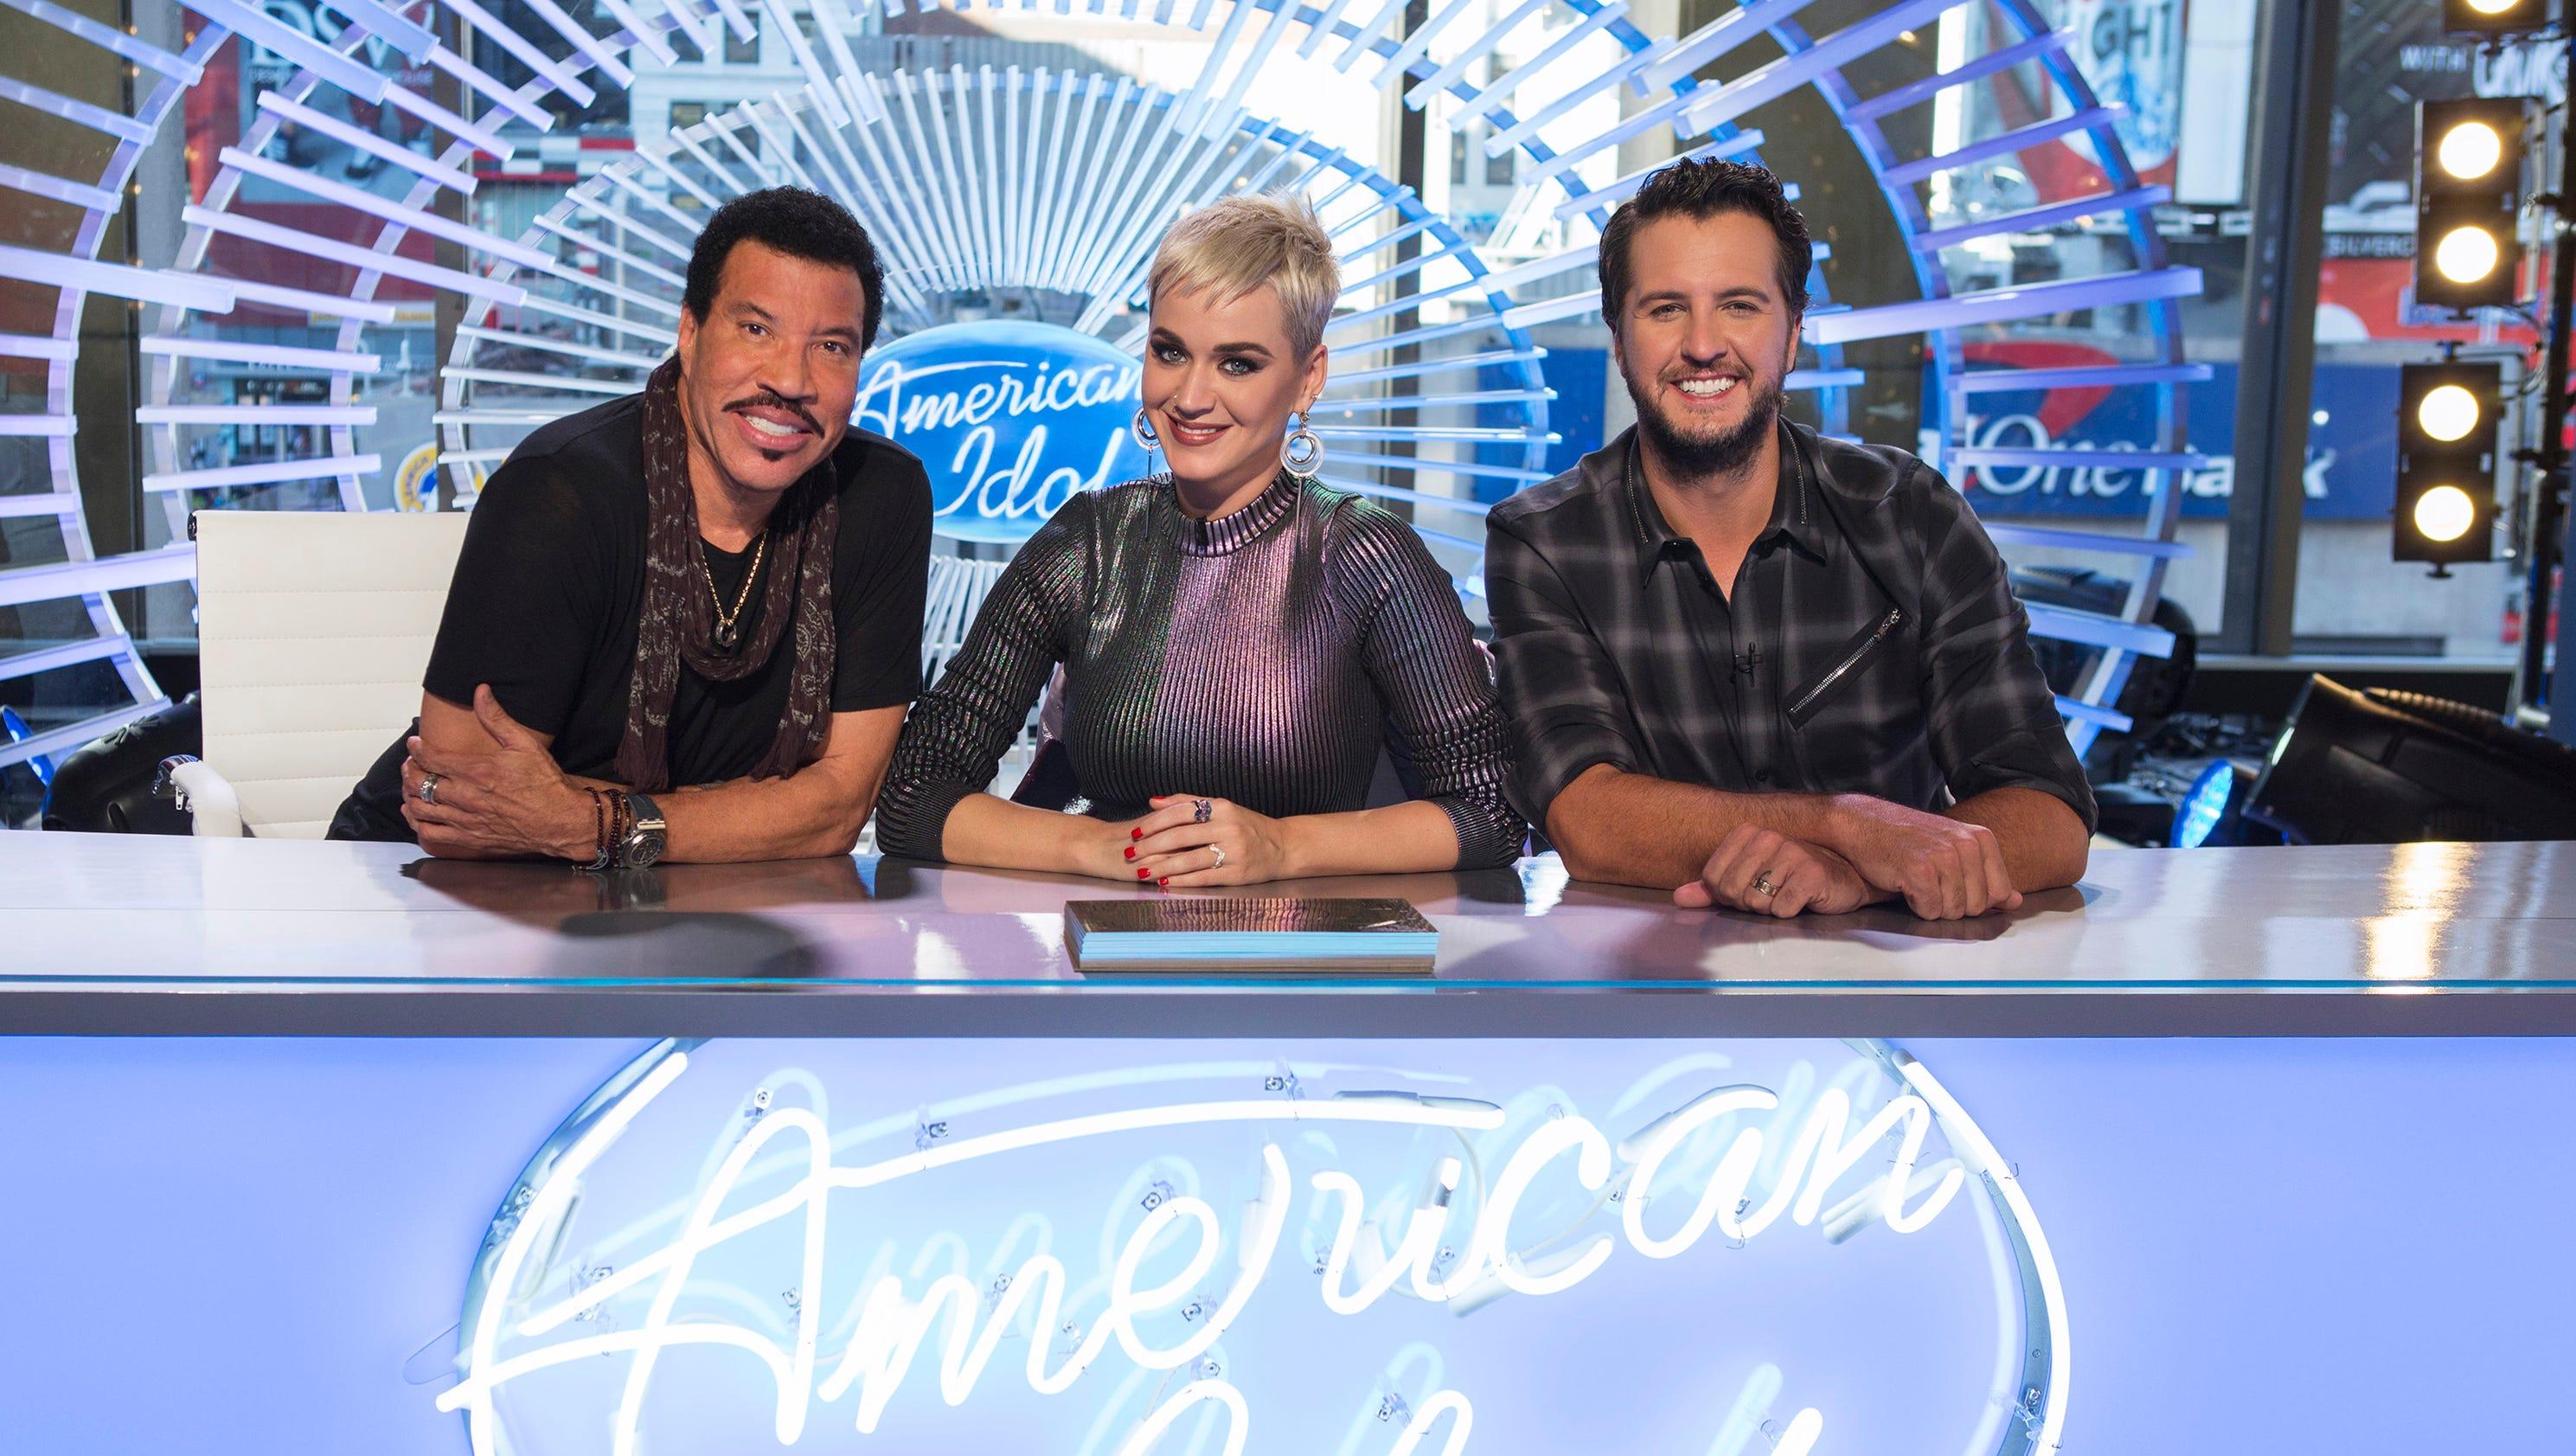 News & views: Katy Perry is dragging down 'American Idol'